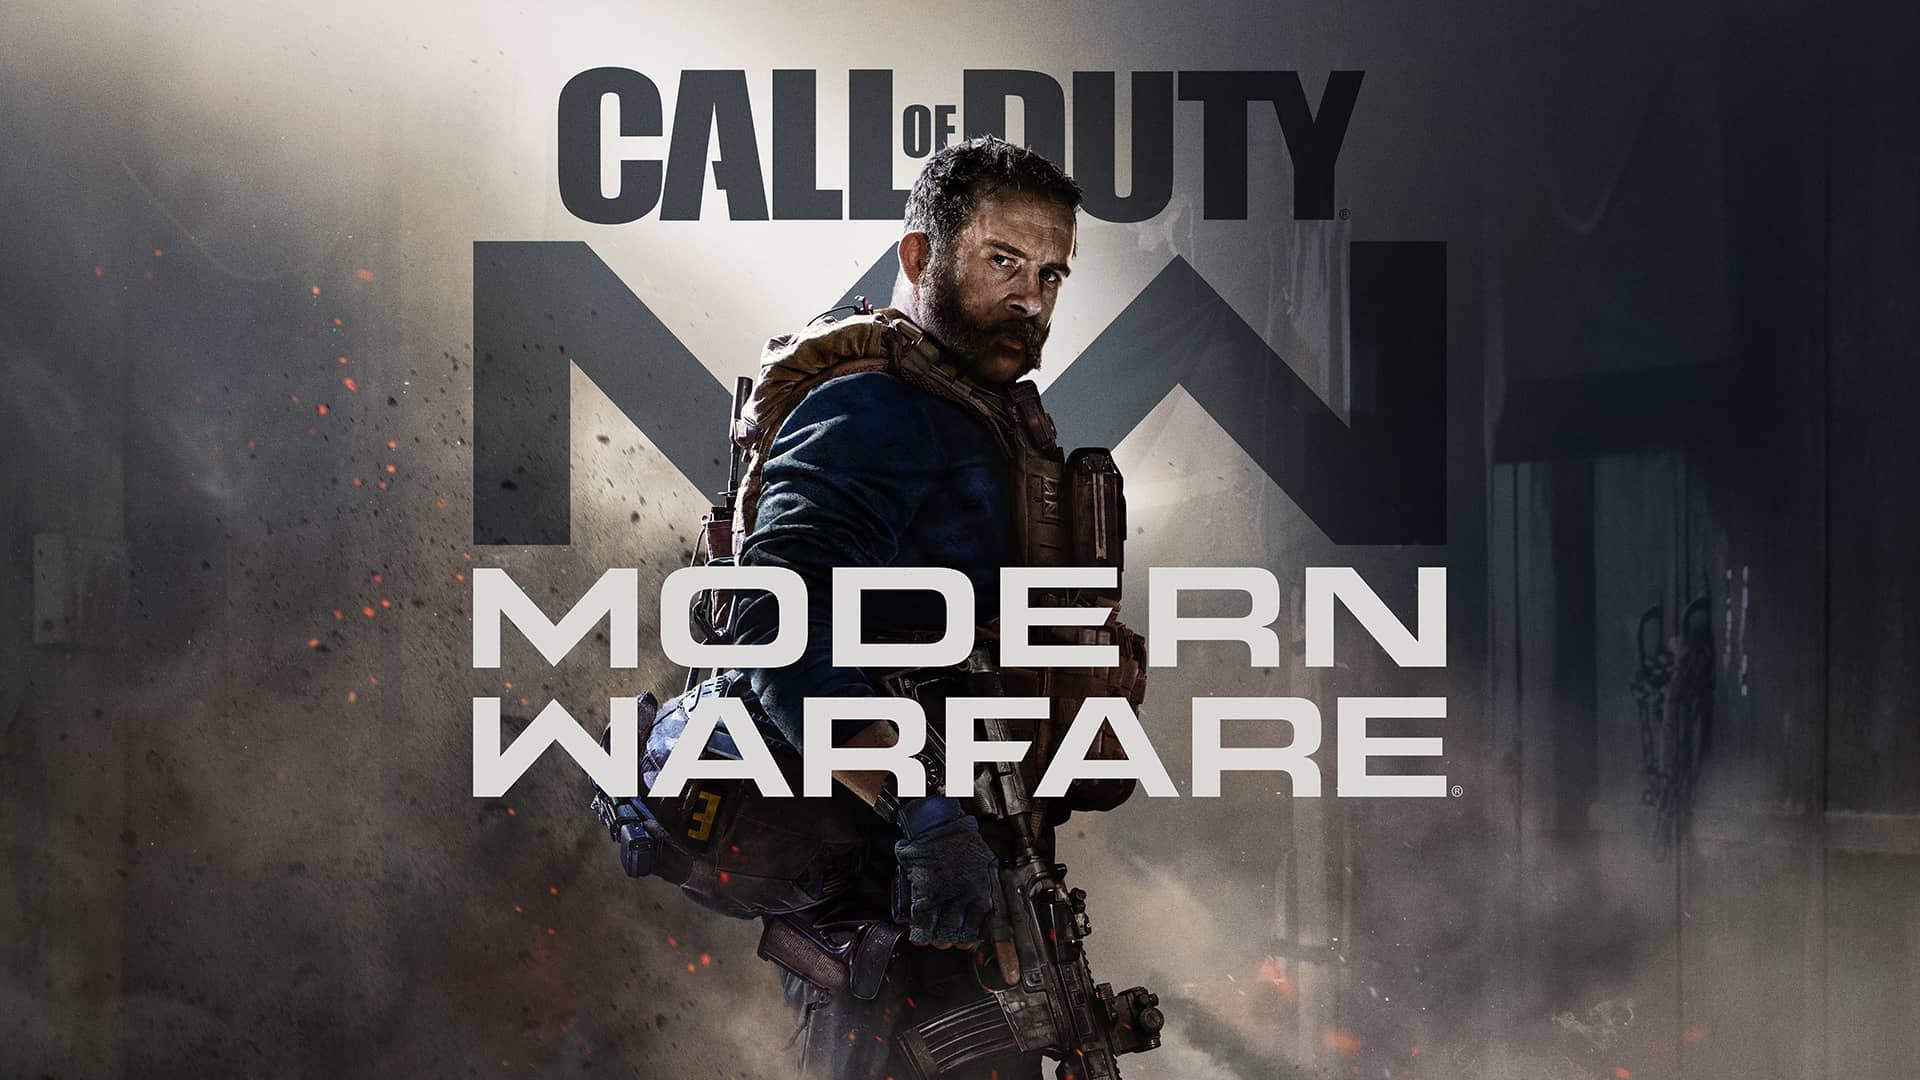 TRAILER: Call Of Duty: Modern Warfare Deploys October 25th